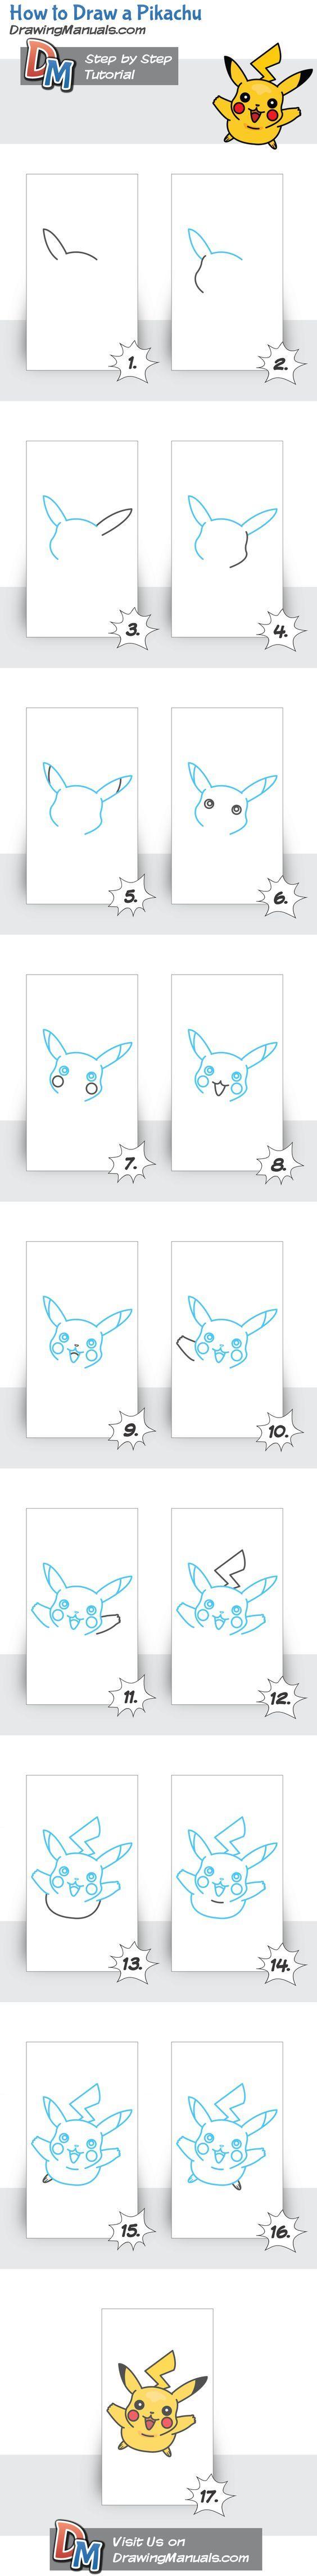 Drawn pikachu picachu To Best Pikachu Pikachu Draw